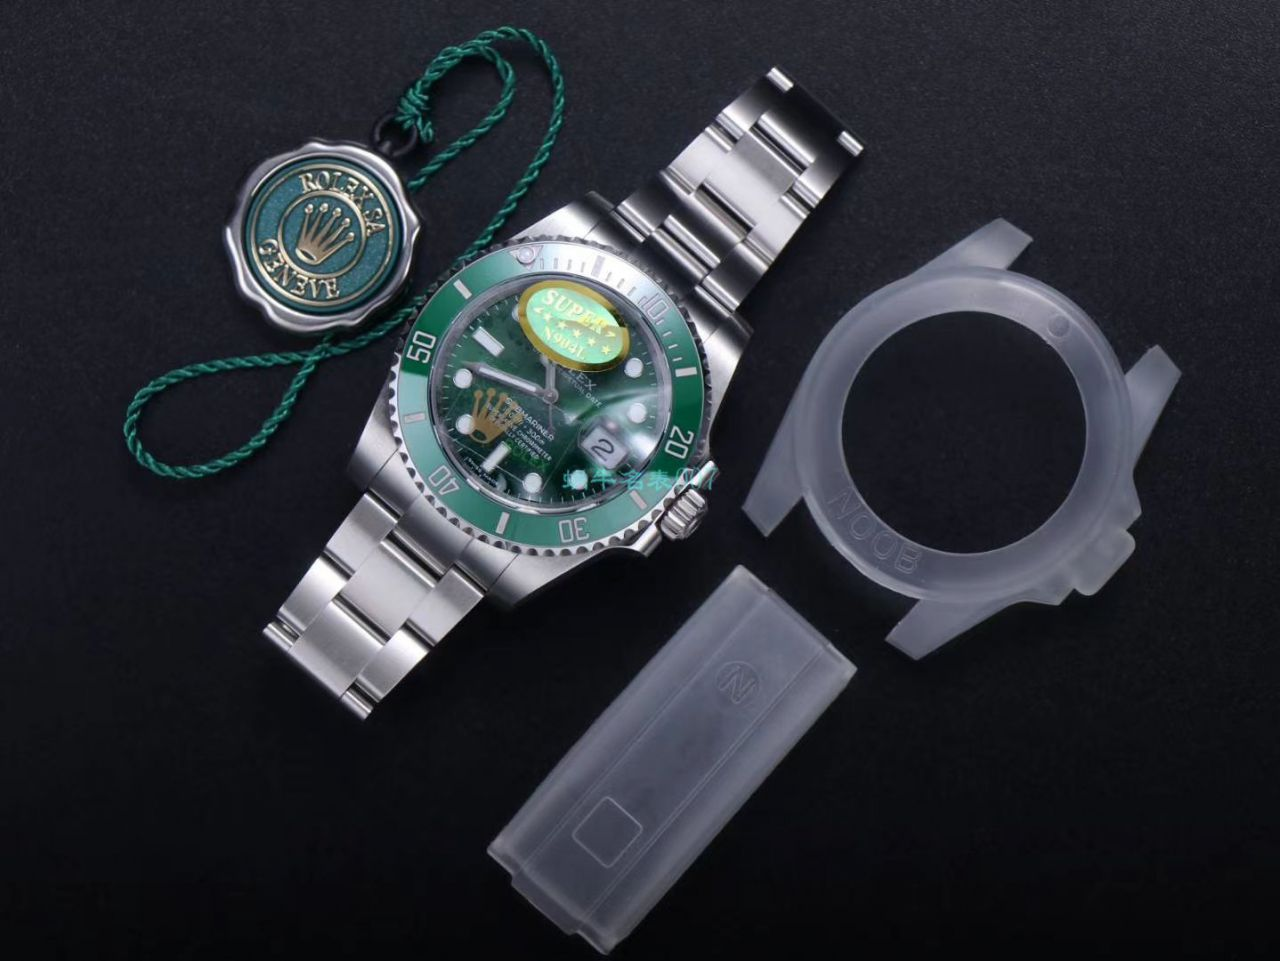 NOOB,N厂 劳力士绿水鬼潜航者V11版本116610LV-97200手表 / R661